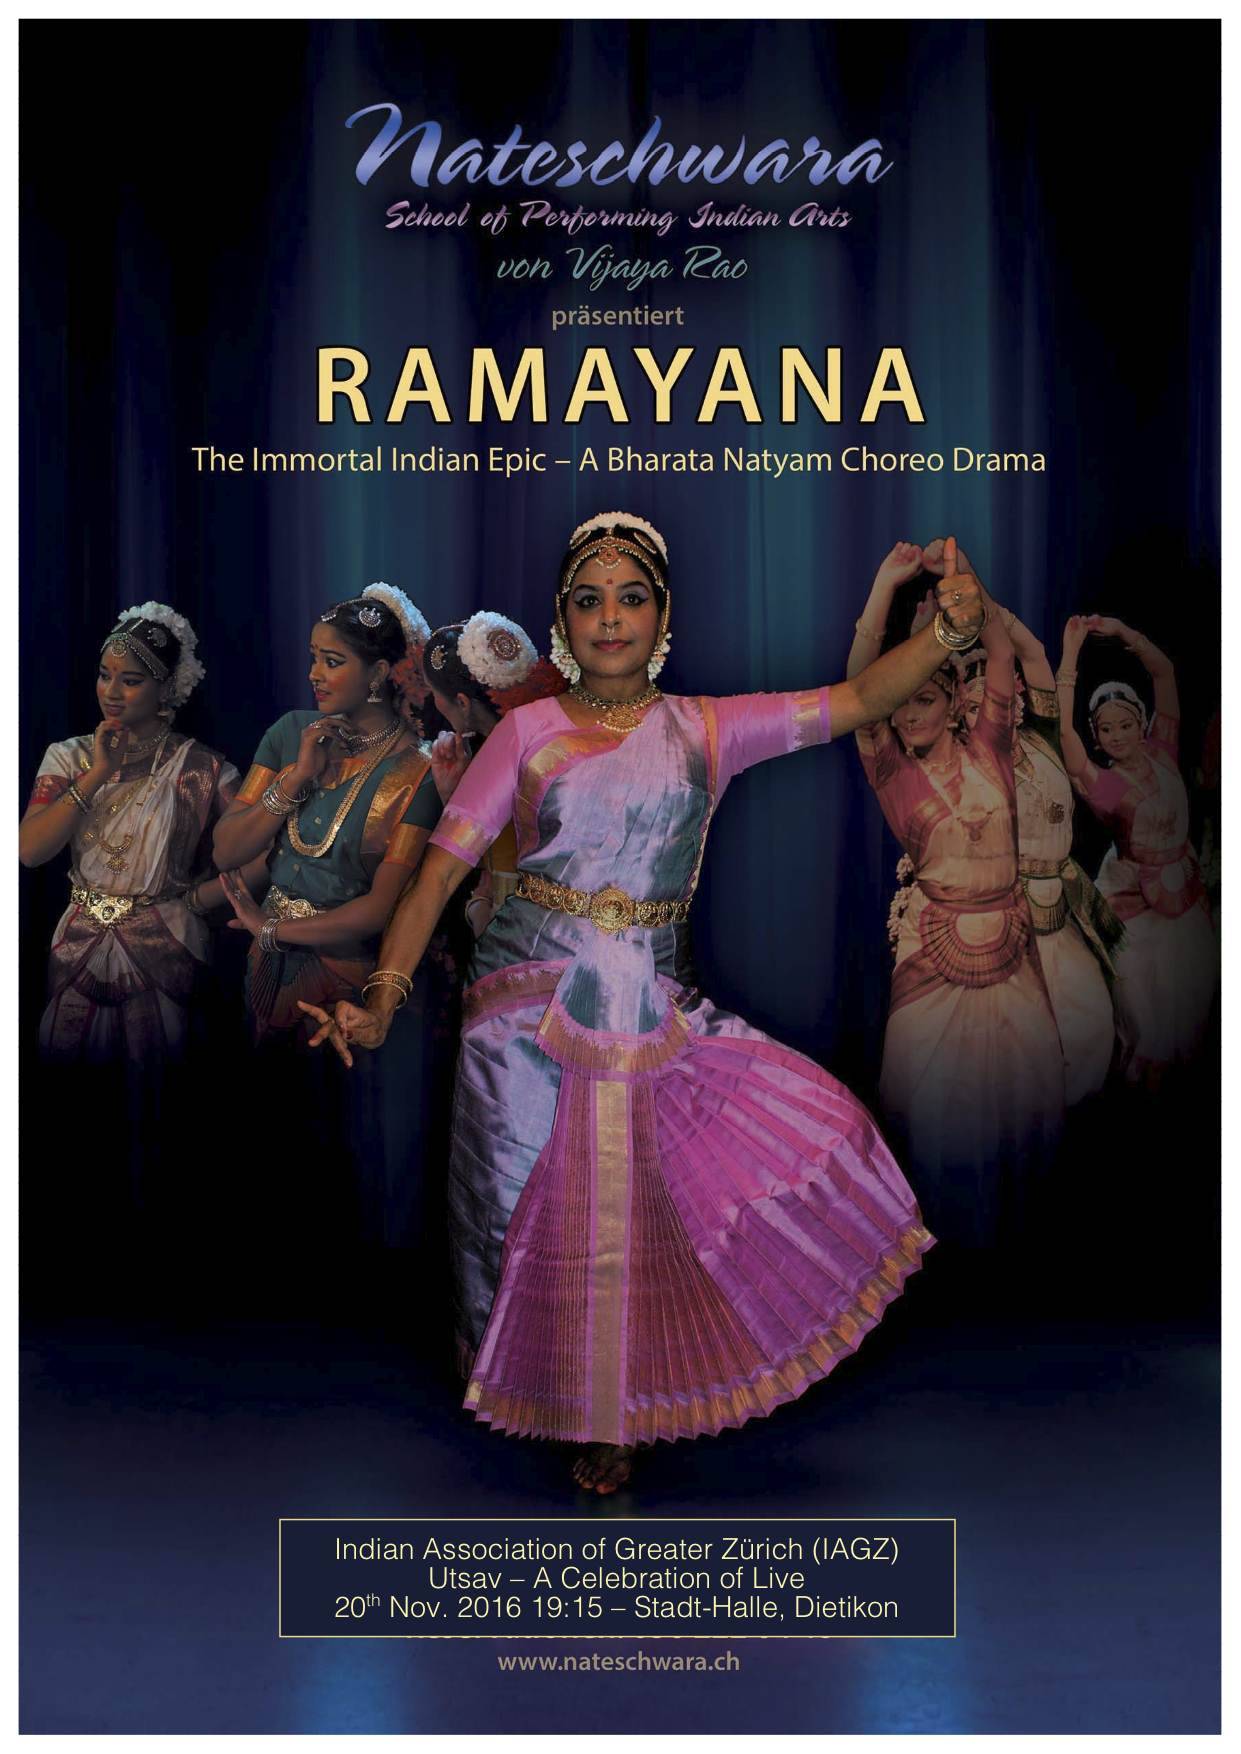 Nateschwara Dancers Ramayana